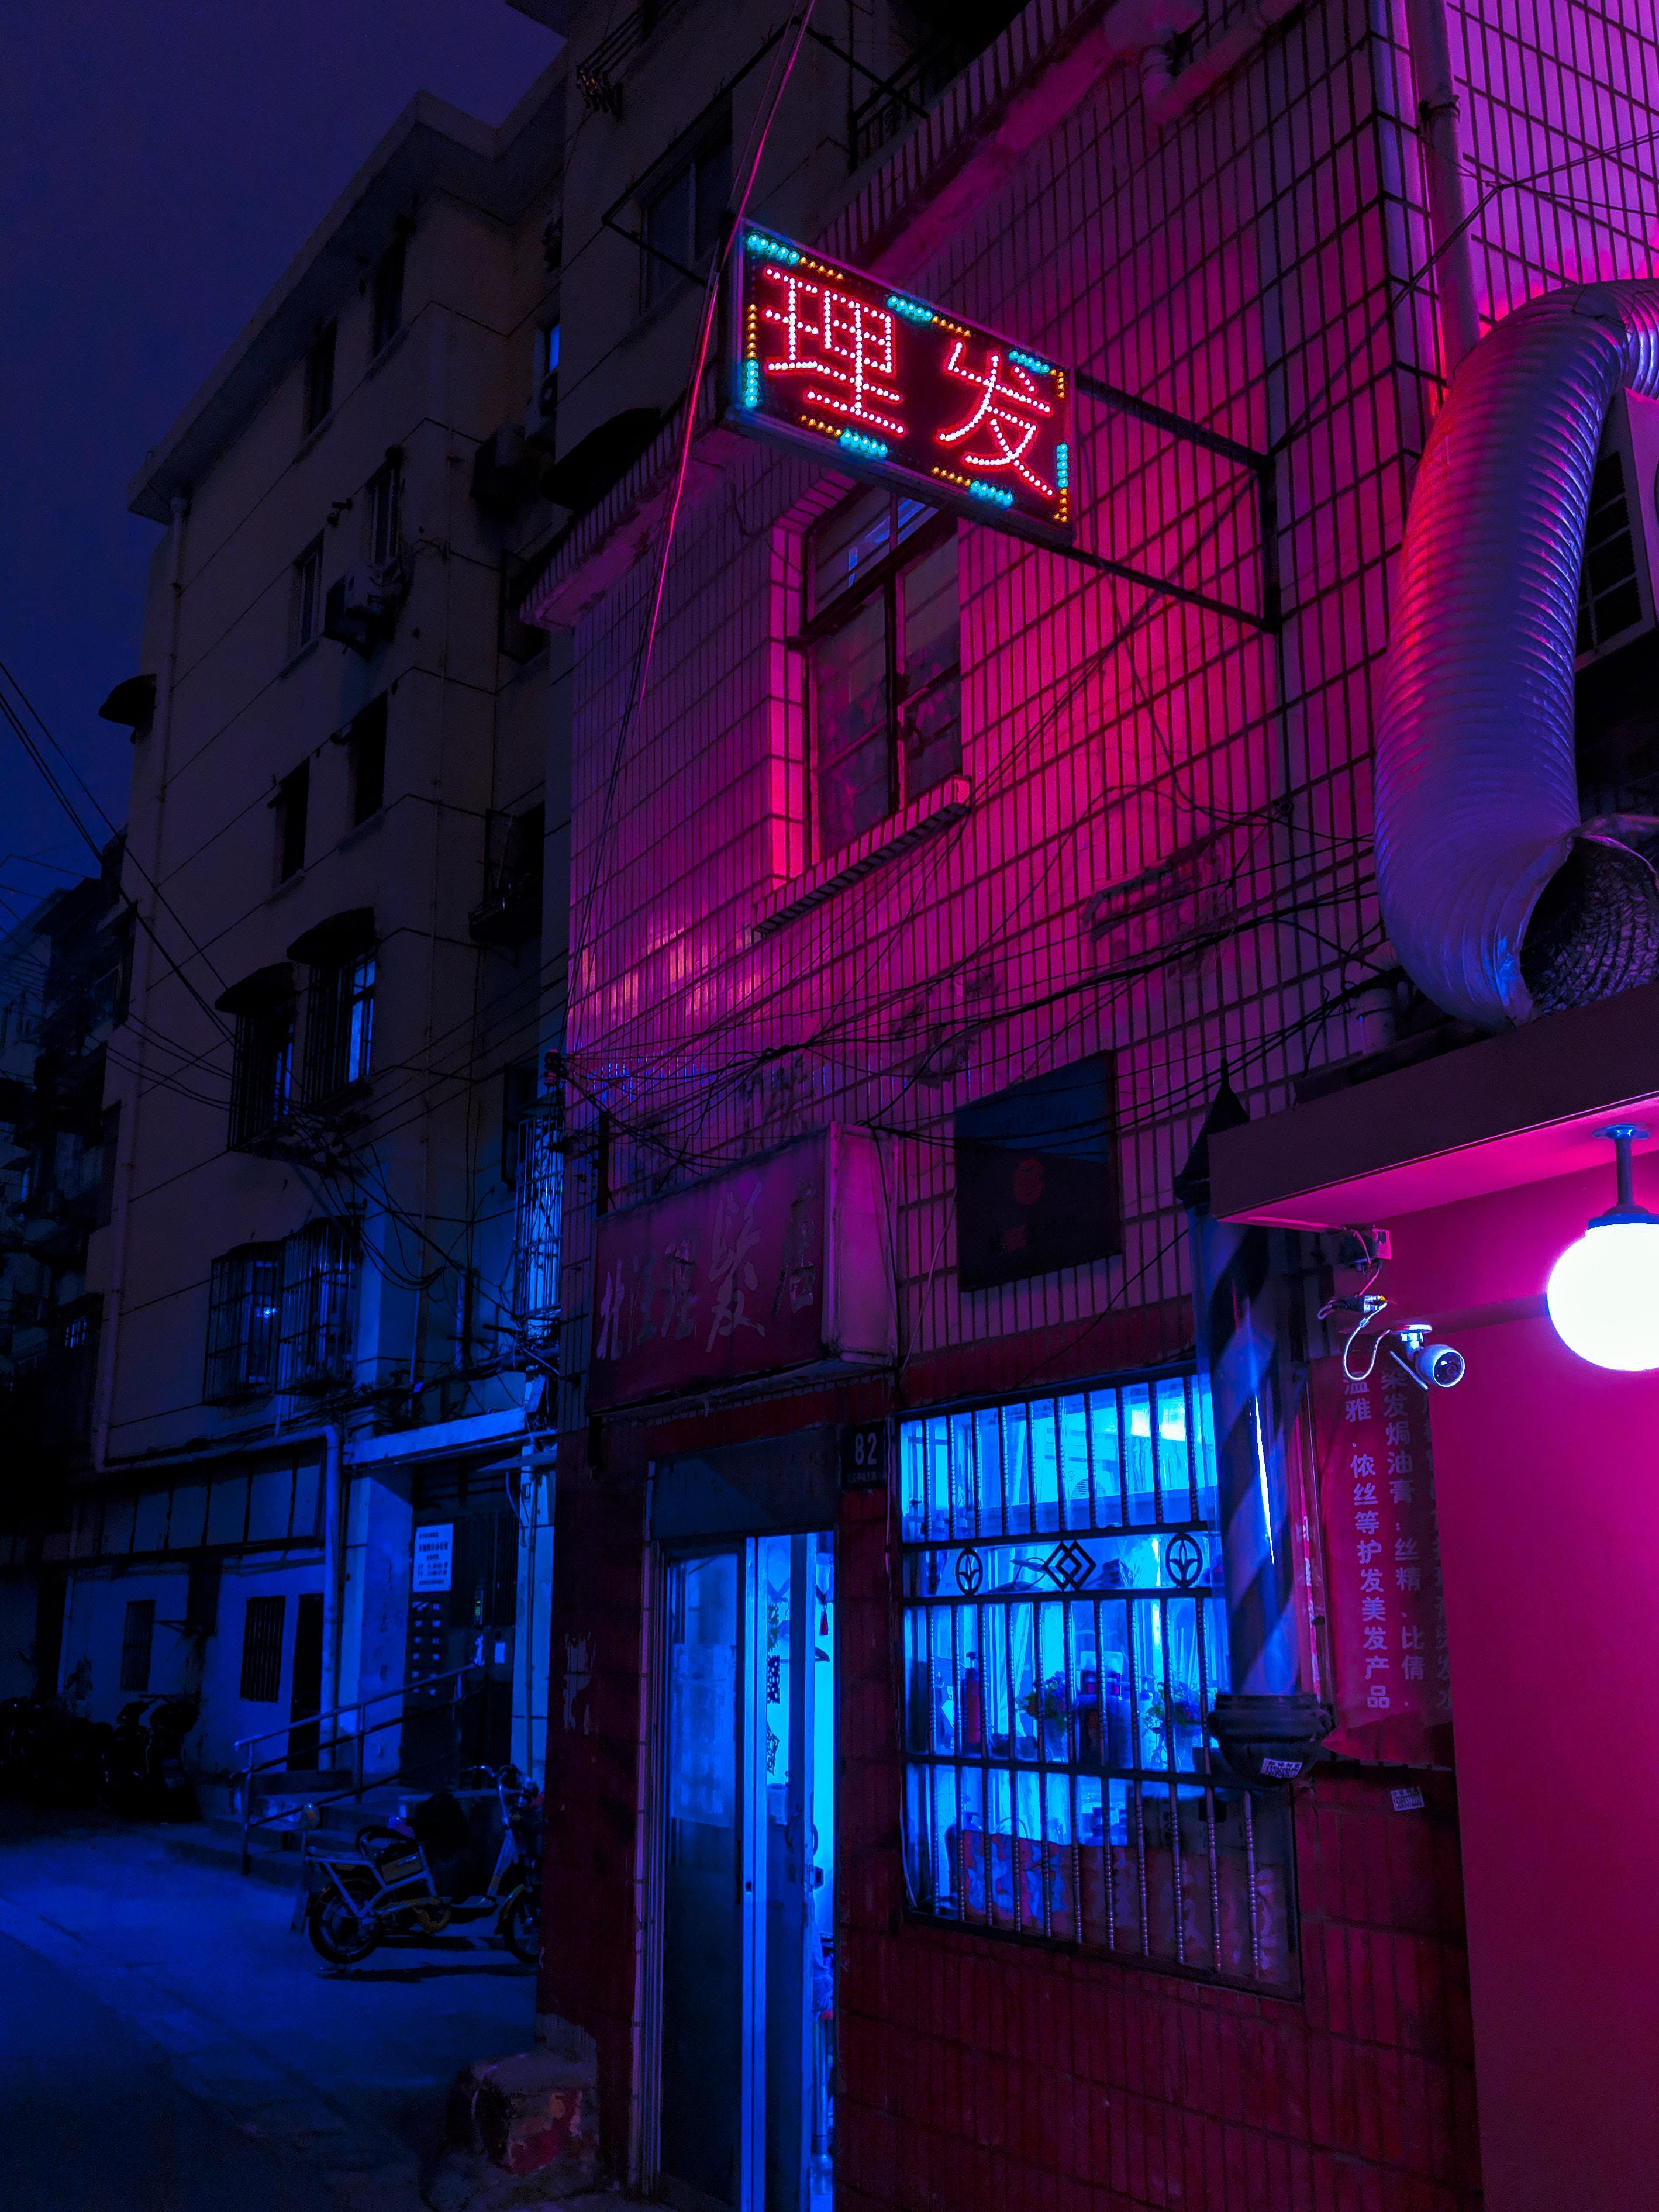 Osore Shanghai Sneak Peek and Unsplash - Cyberpunk Lightroom Presets